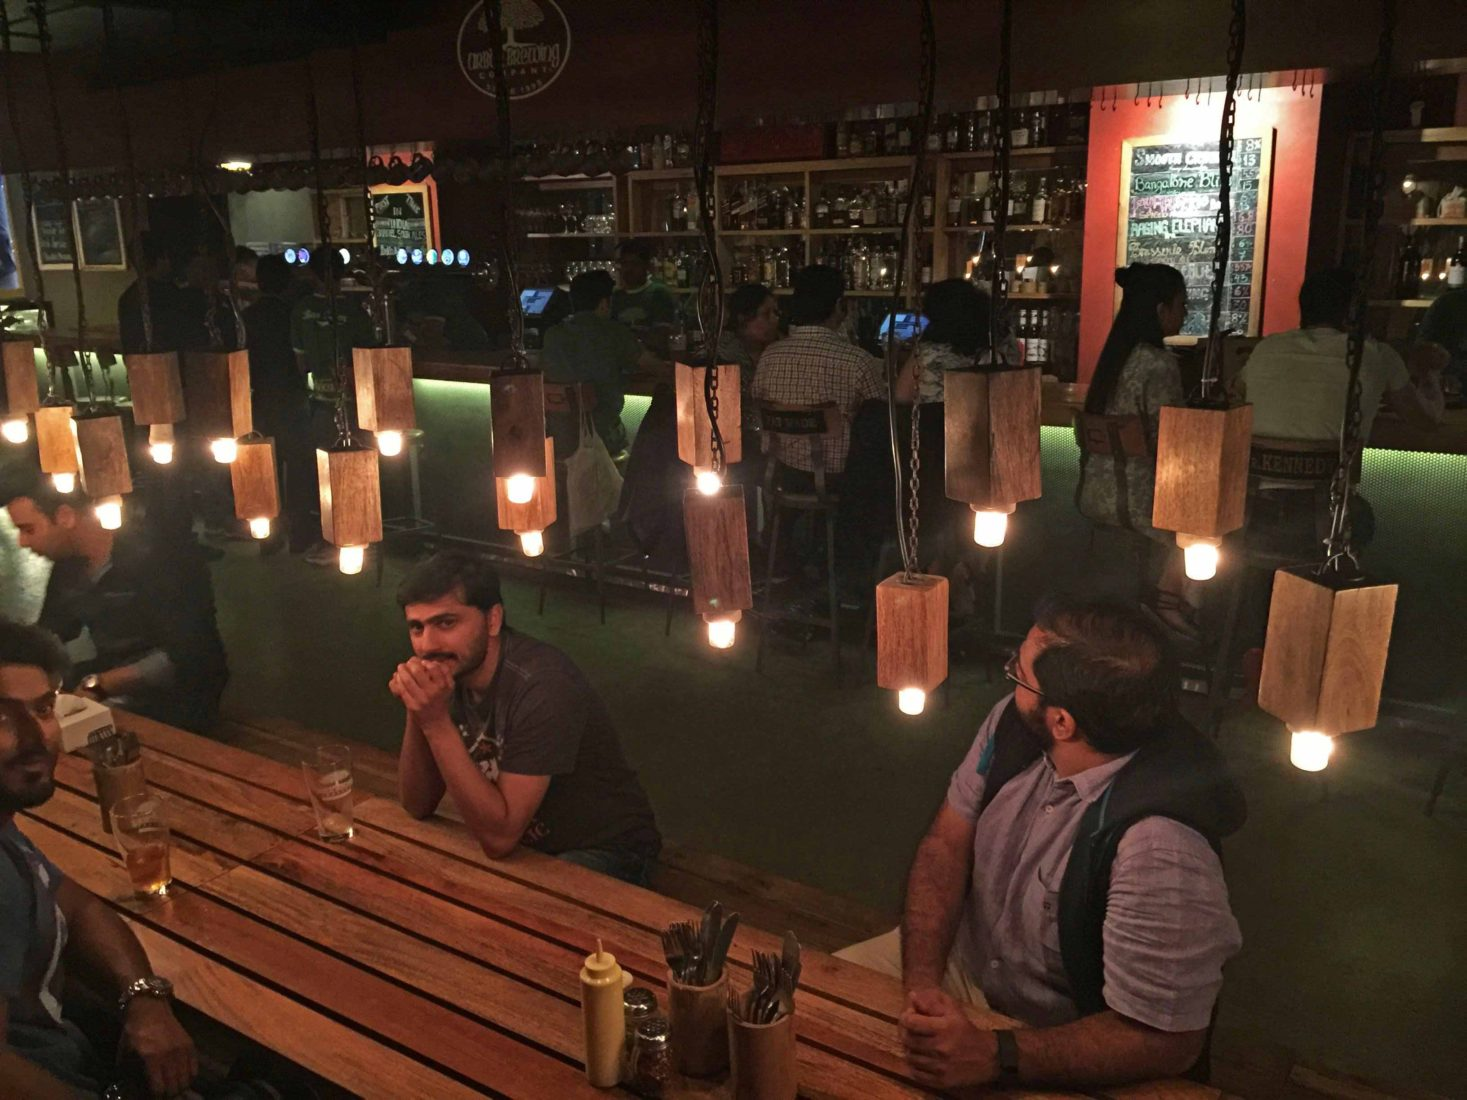 255. Arbor Brewing Company, Bangalore India, 2015